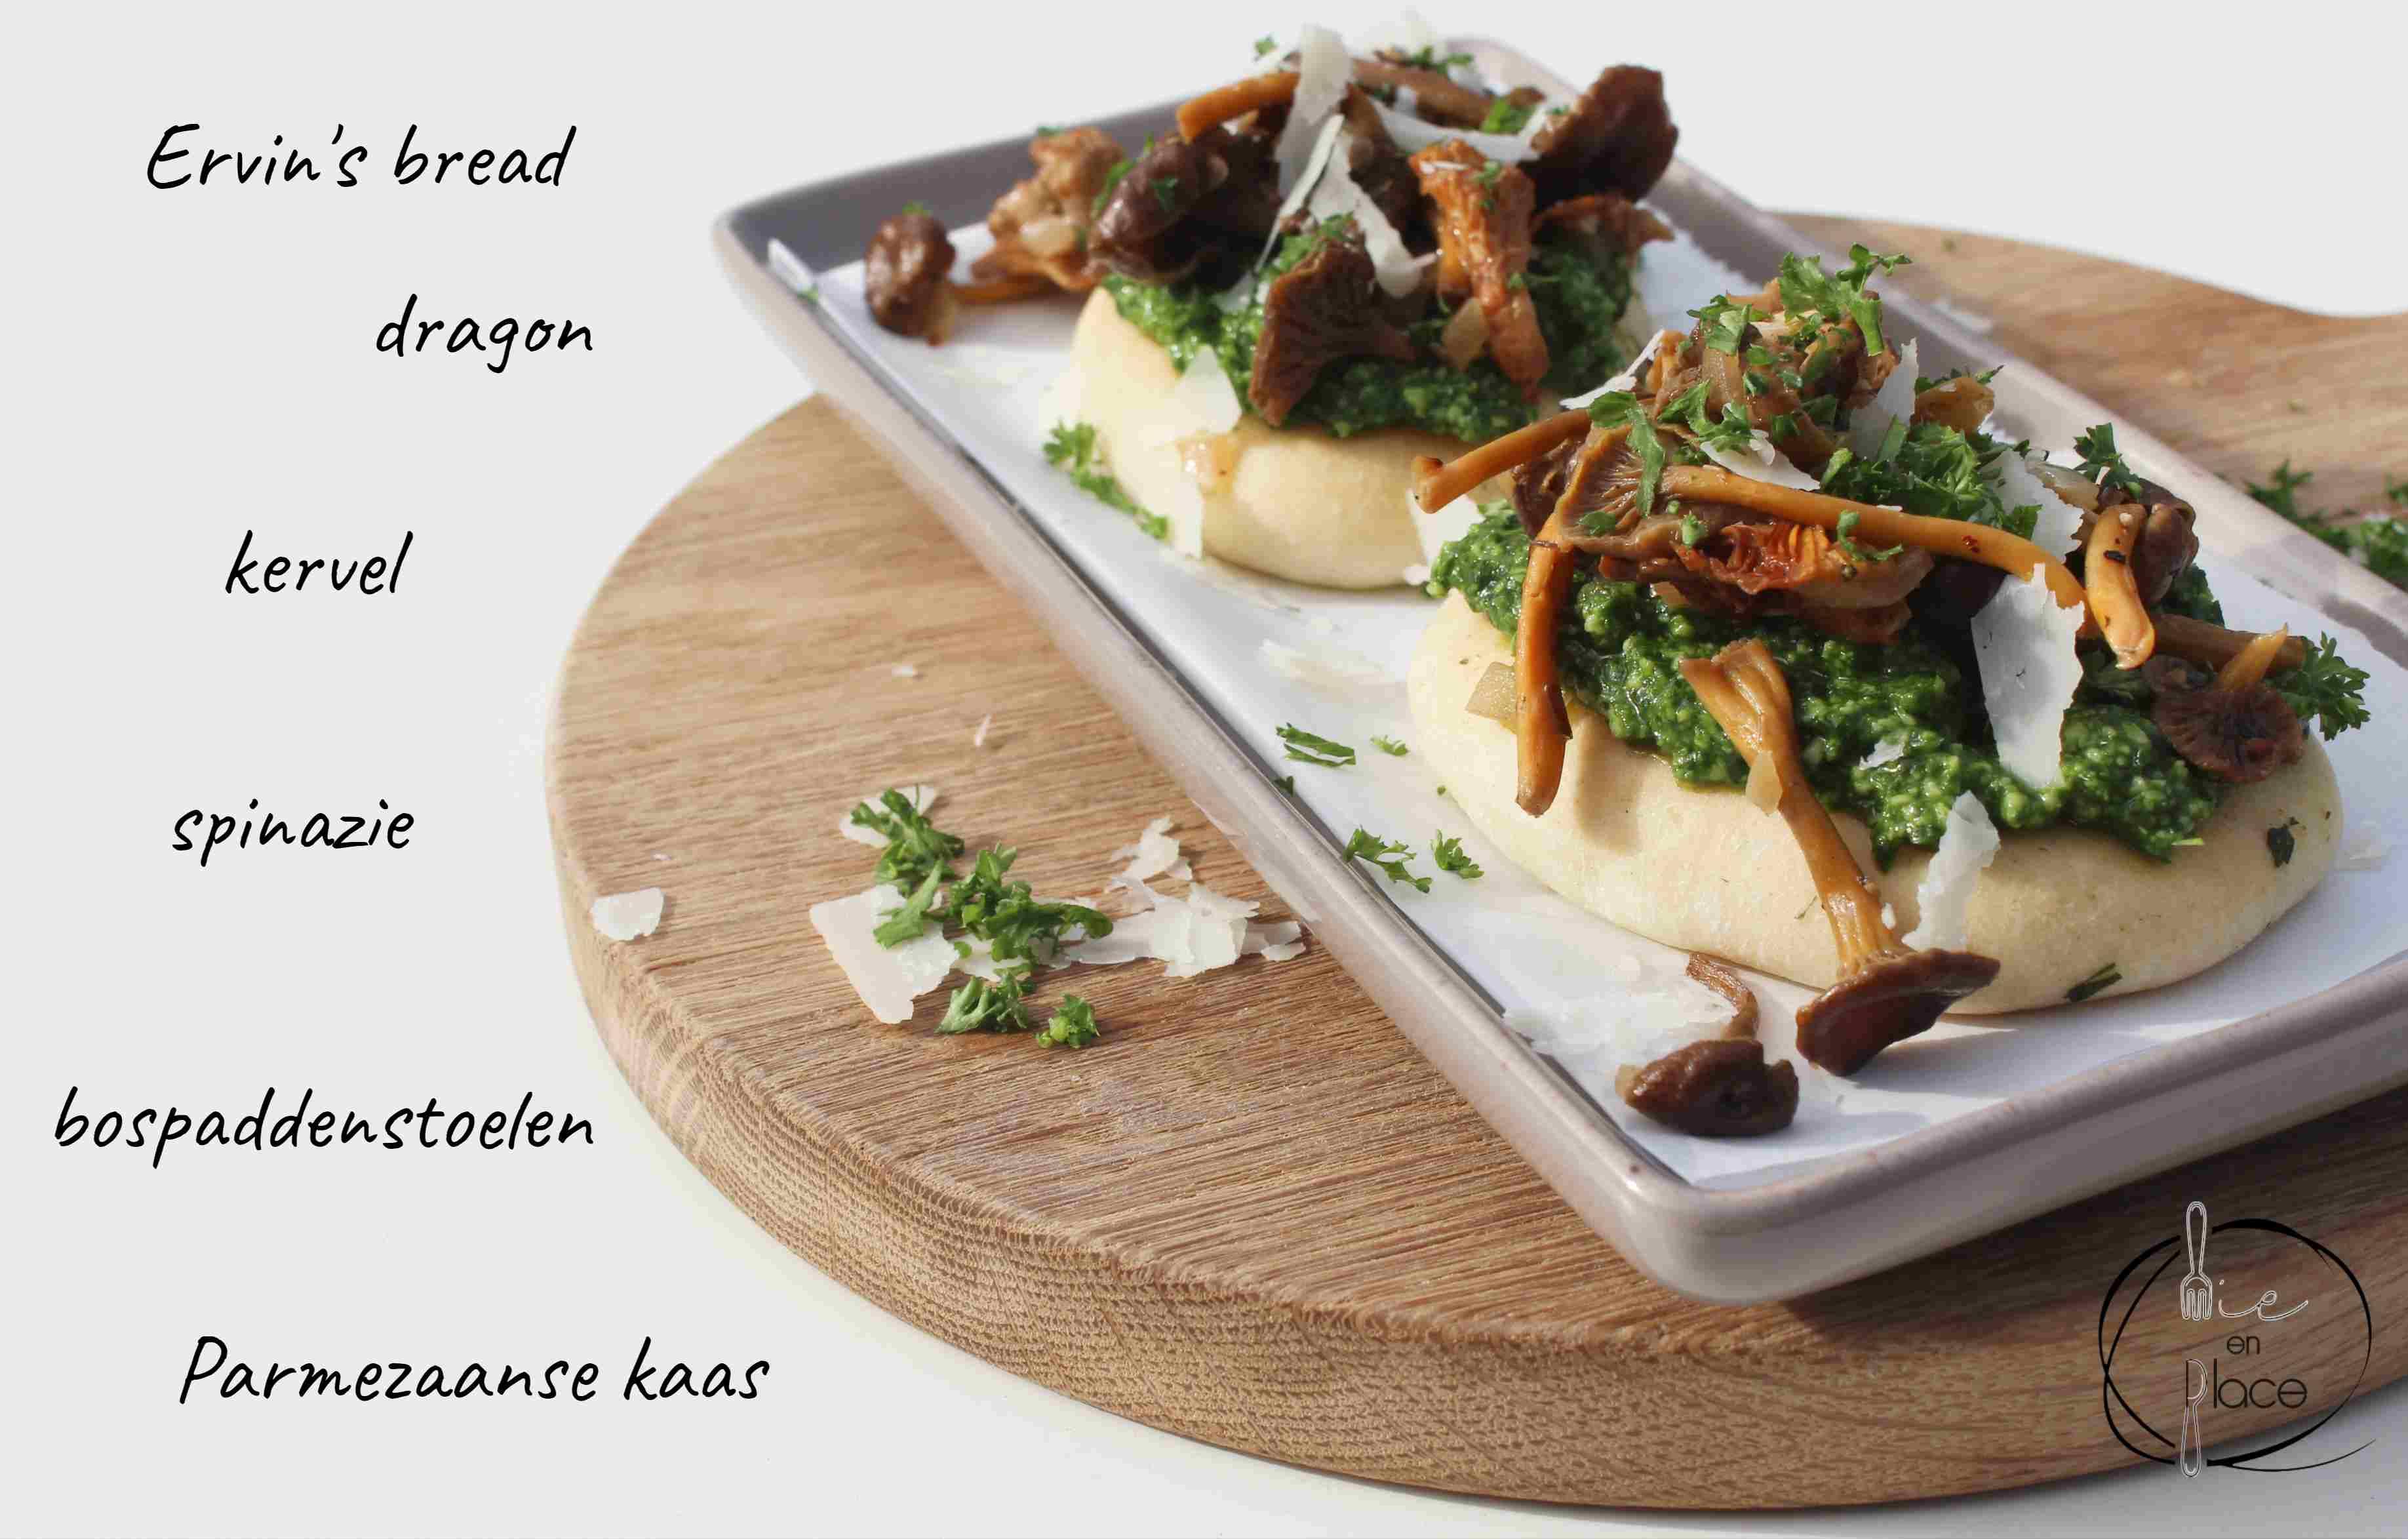 Toast champignon nieuwe stijl